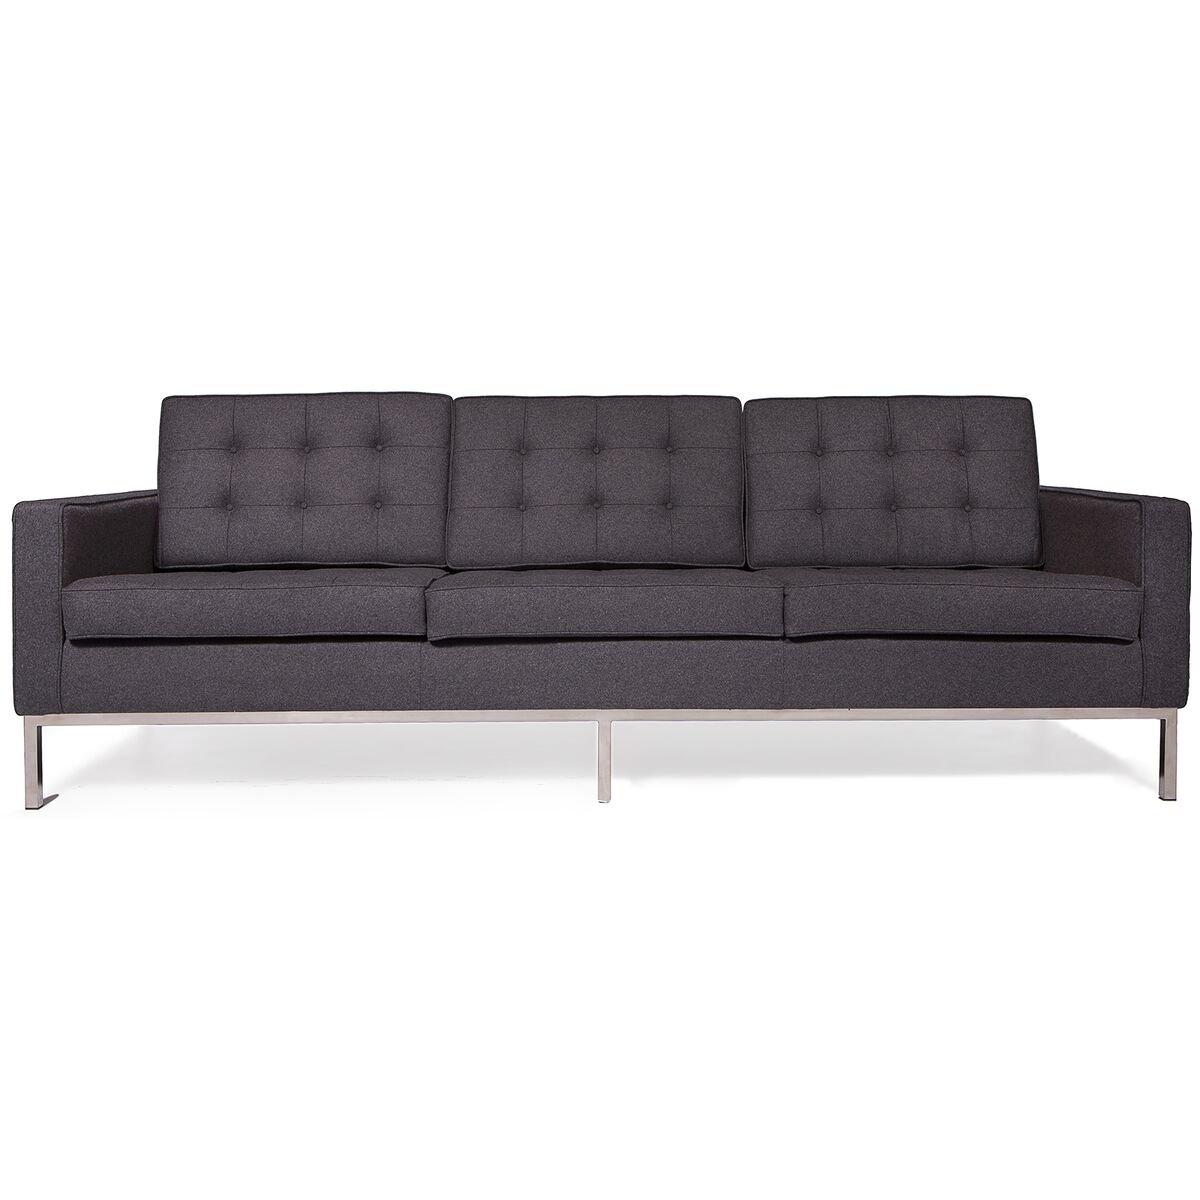 LeisureMod Florence Style Mid Century Modern Tufted Sofa (Dark Grey Wool)